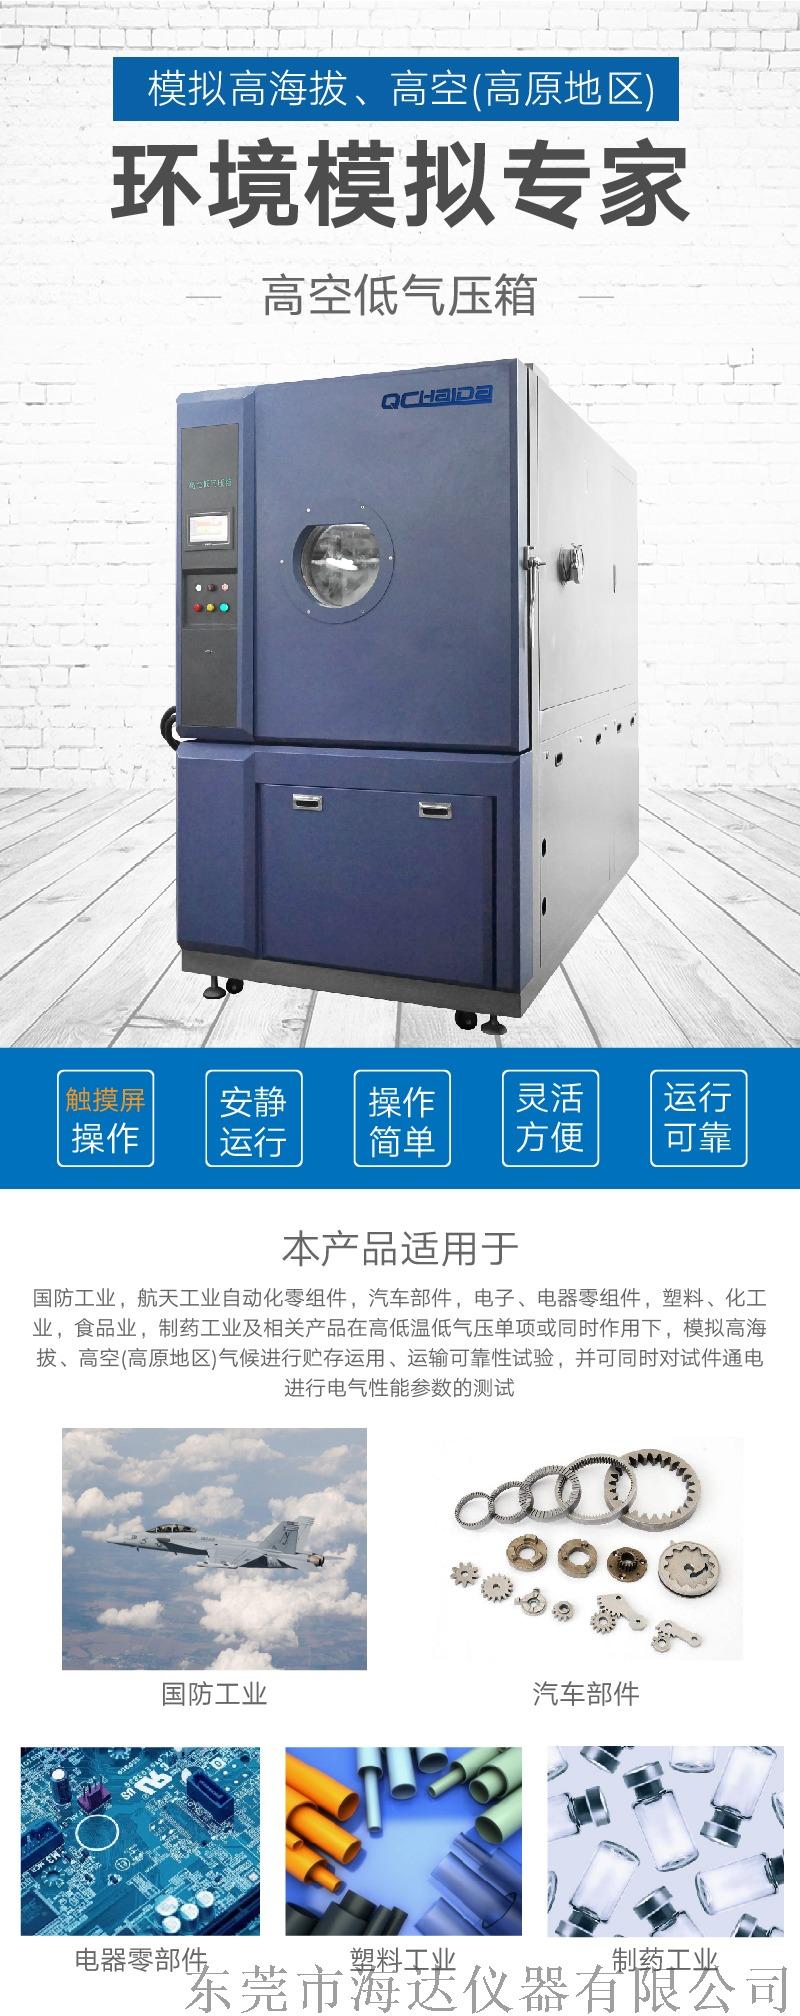 HD-E714高空低气压试验机 (1).jpg